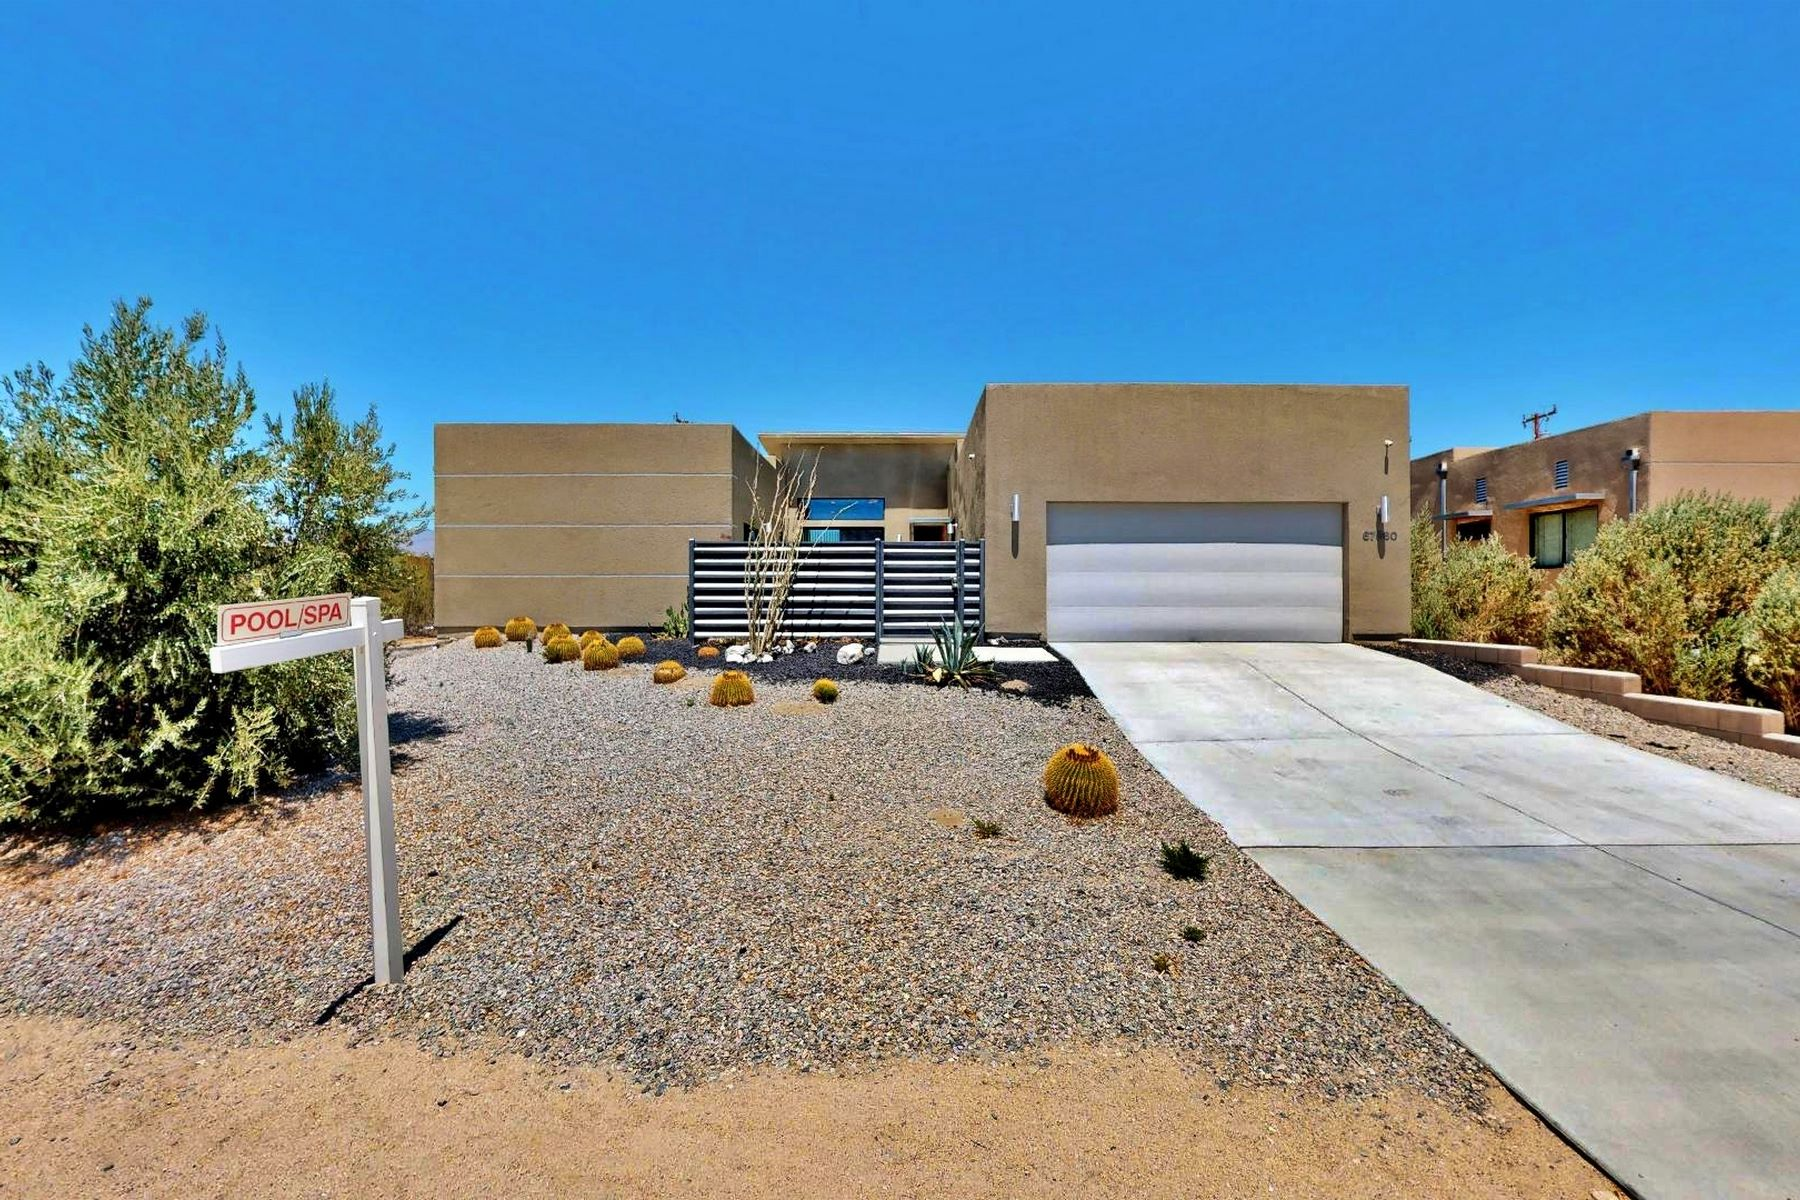 Single Family Homes for Sale at 67560 El Sombrero Lane 67560 El Sombrero Ln Desert Hot Springs, California 92241 United States